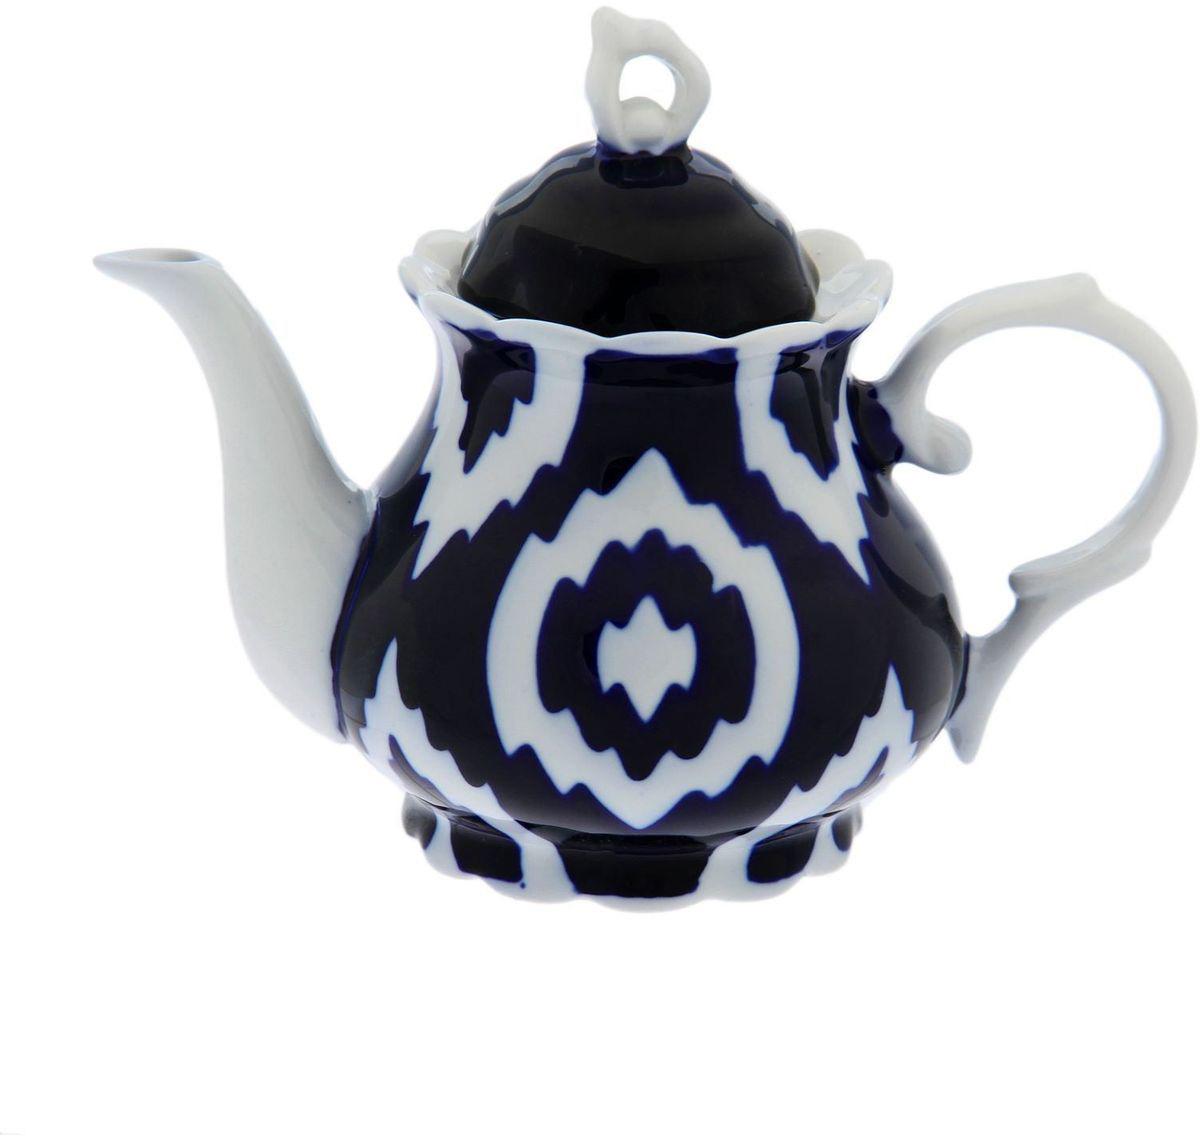 Фото - Чайник заварочный Turon Porcelain Атлас, цвет: синий, белый, 800 мл тарелка turon porcelain атлас цвет белый синий золотистый диаметр 22 5 см